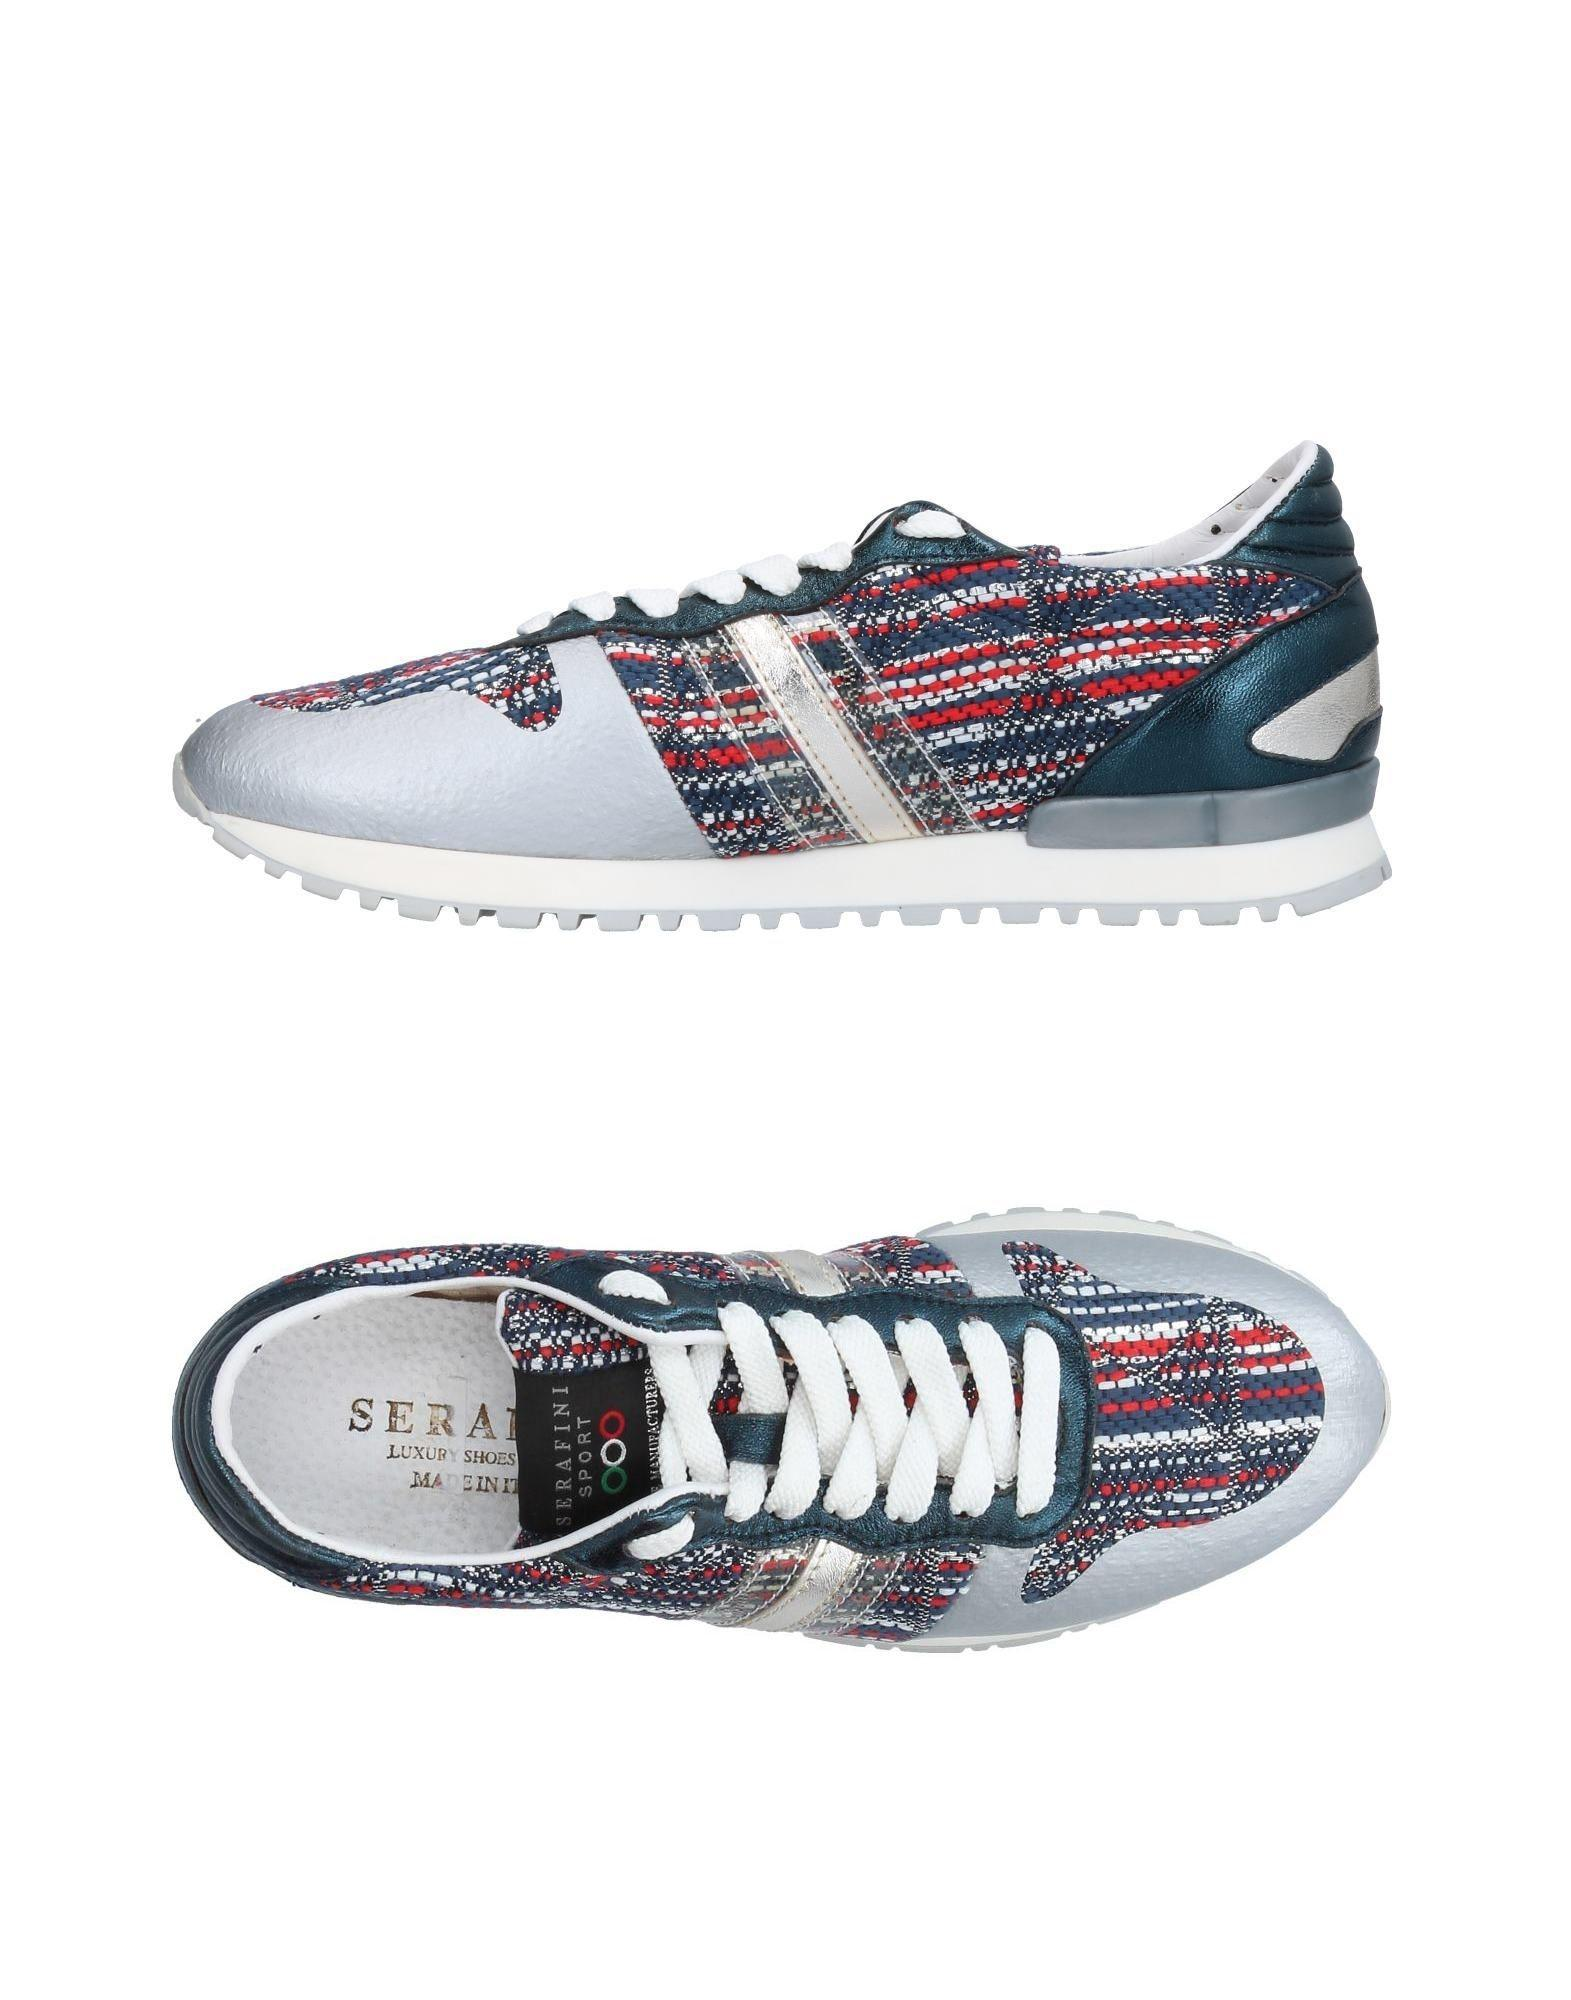 FOOTWEAR - Low-tops & sneakers Serafini hK9sc